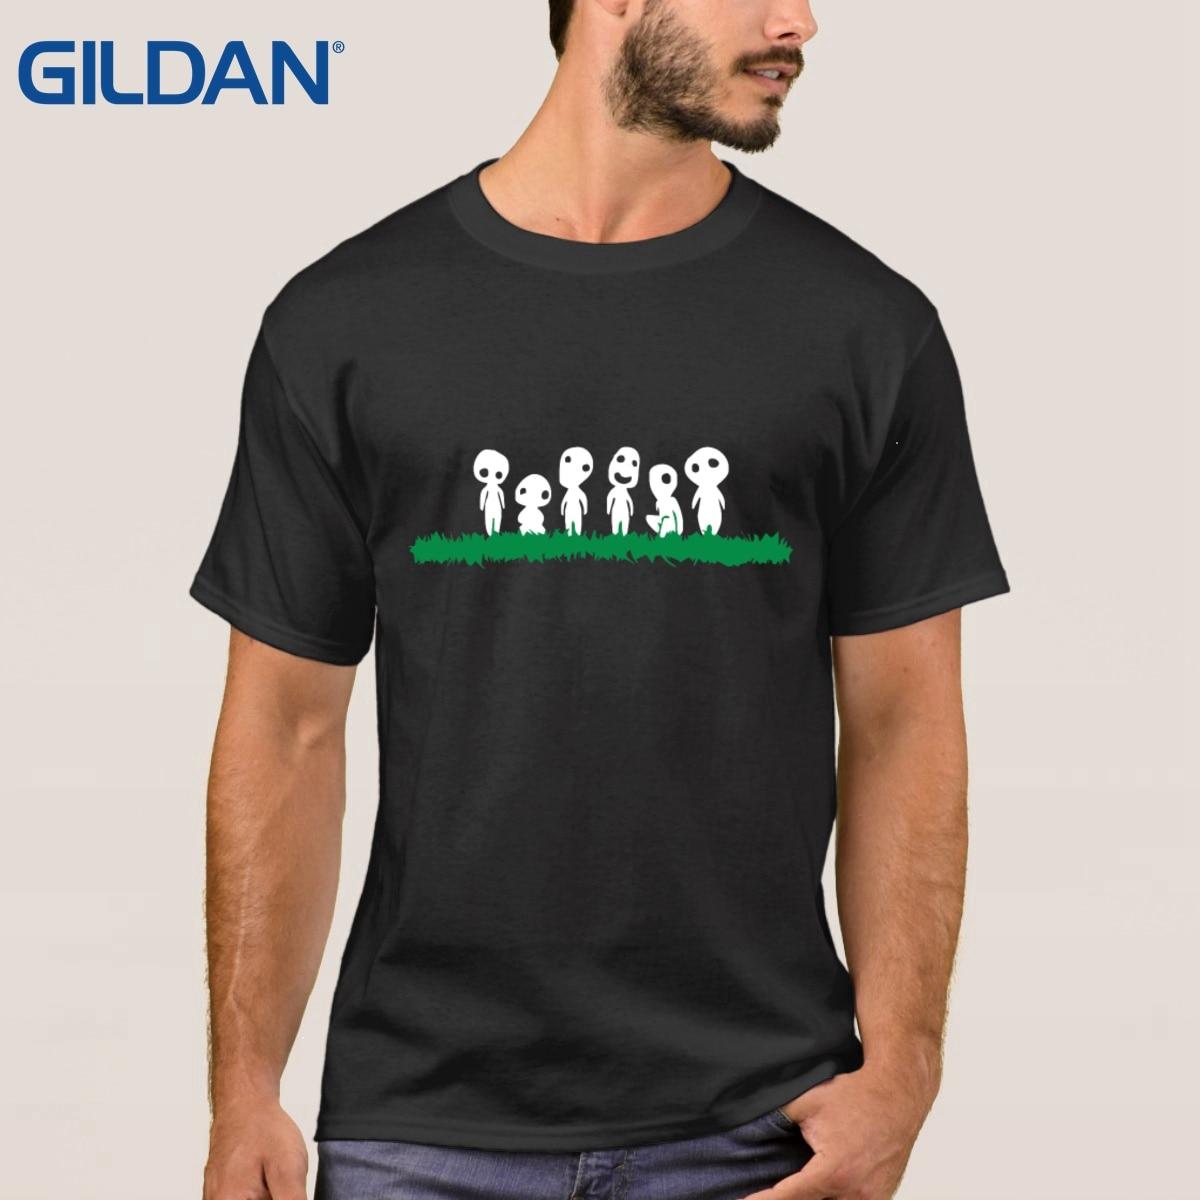 Design t shirts and sell online - Color Enhanced Kodama Spirit Movie Color Enhanced T Shirt Black Men Splicing Cloth Design T Shirt Online Tops Sale Oversized